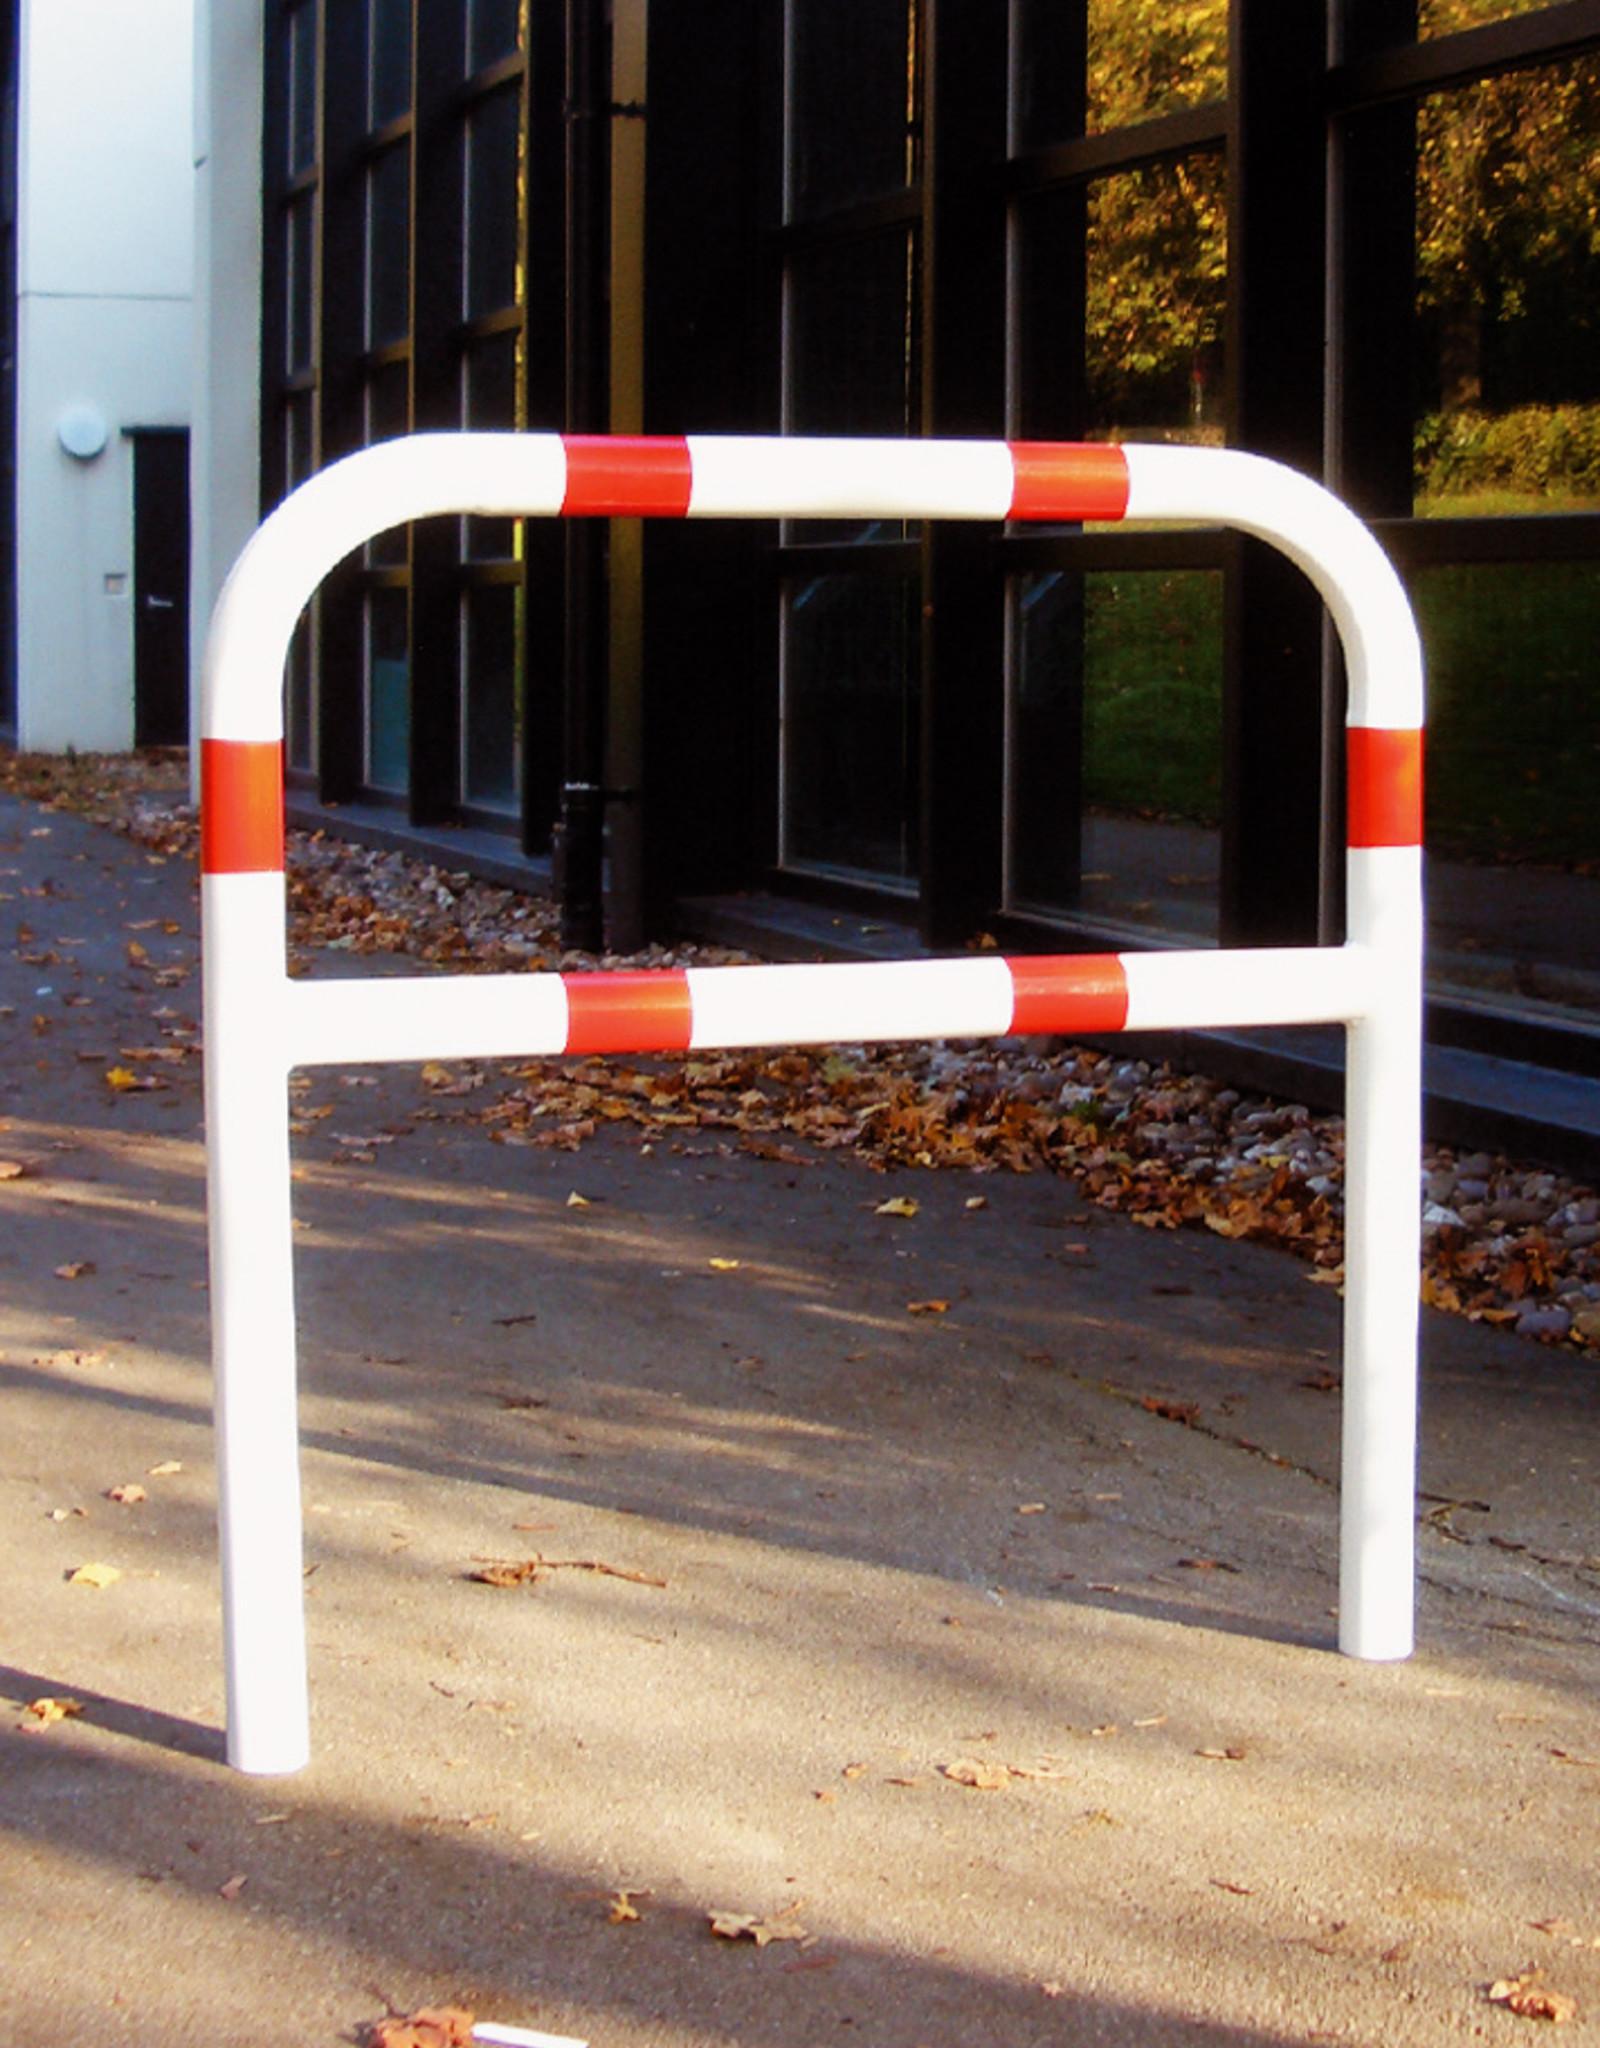 Ri-Traffic | Fietssluis Staal, Rood-Wit, 150 cm x 140 cm